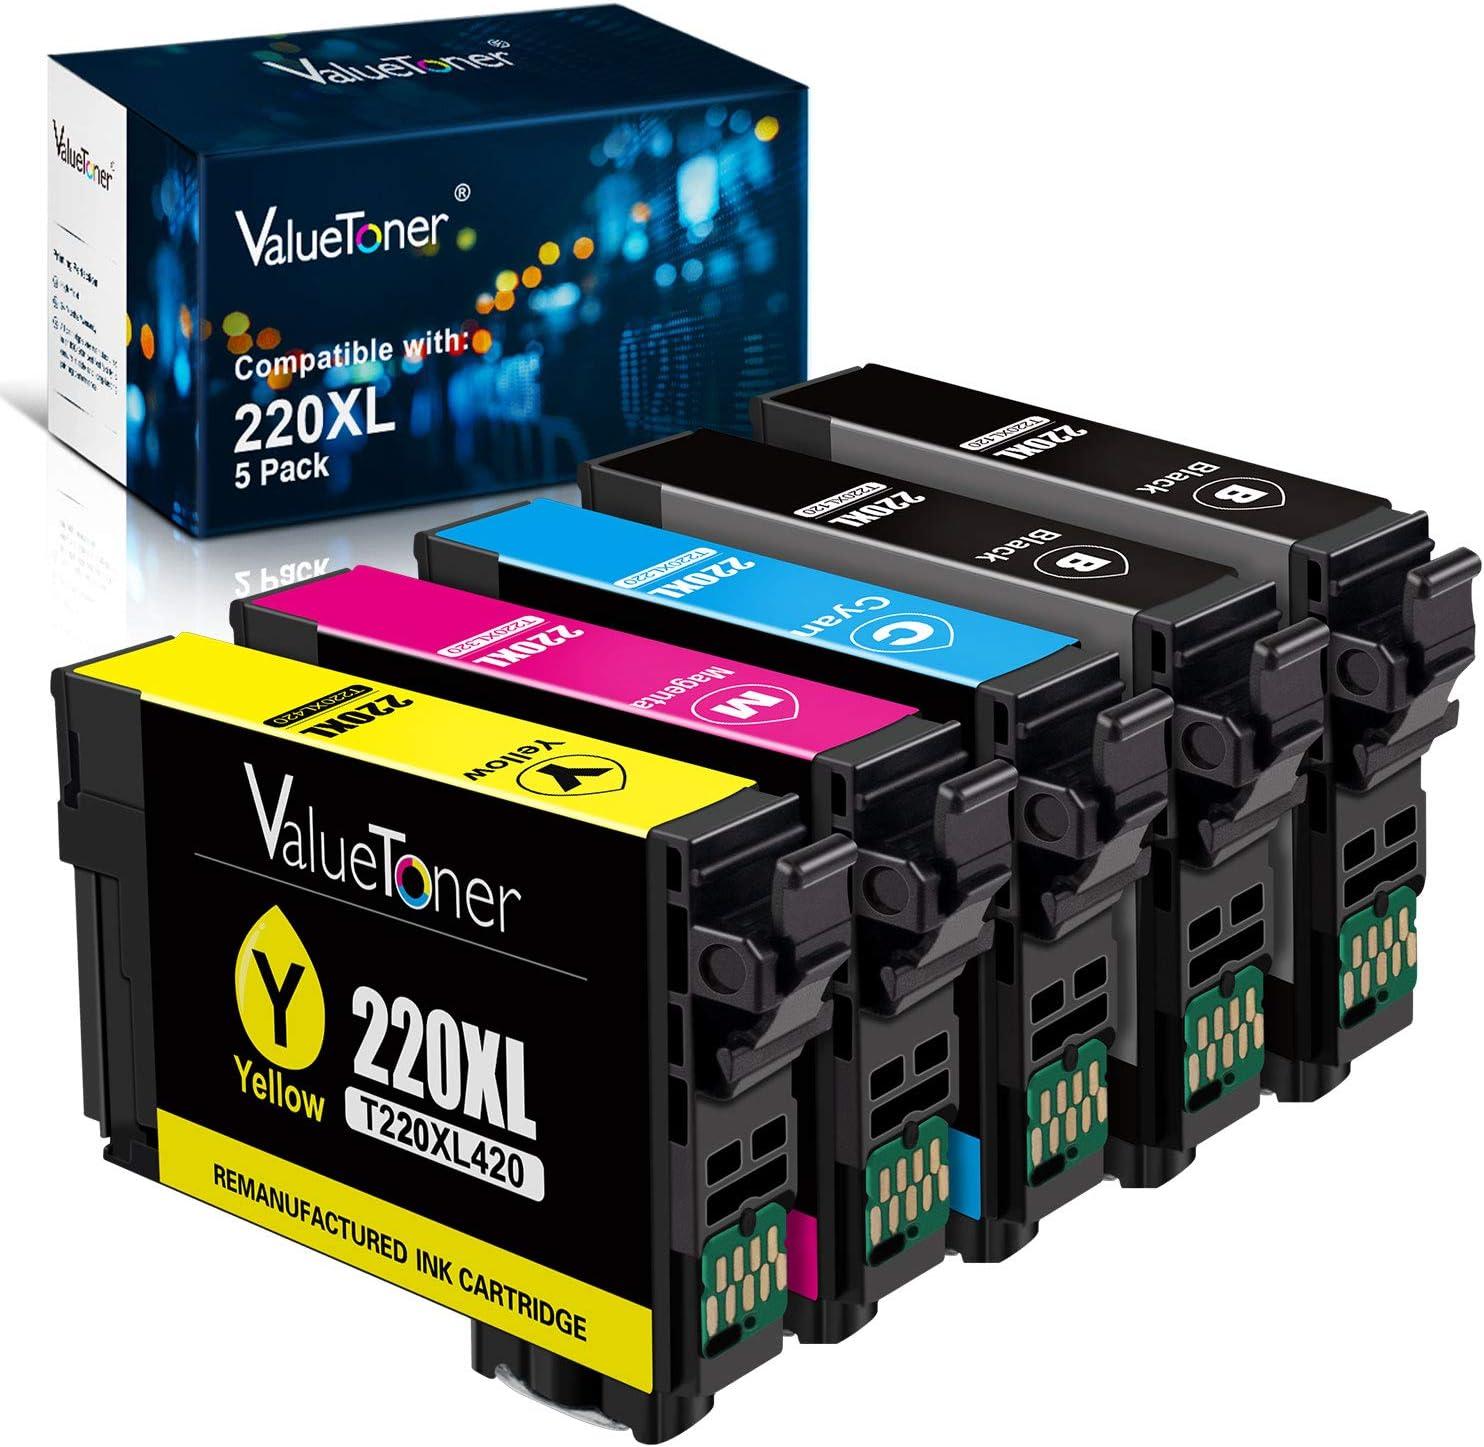 Valuetoner Remanufactured Ink Cartridge Replacement for Epson 220 220XL T220XL for Workforce WF-2760,WF-2750,WF-2630, WF-2650, WF-2660,XP-320,XP-420,XP-424 (2 Black,1 Cyan,1 Magenta,1 Yellow, 5 Pack)